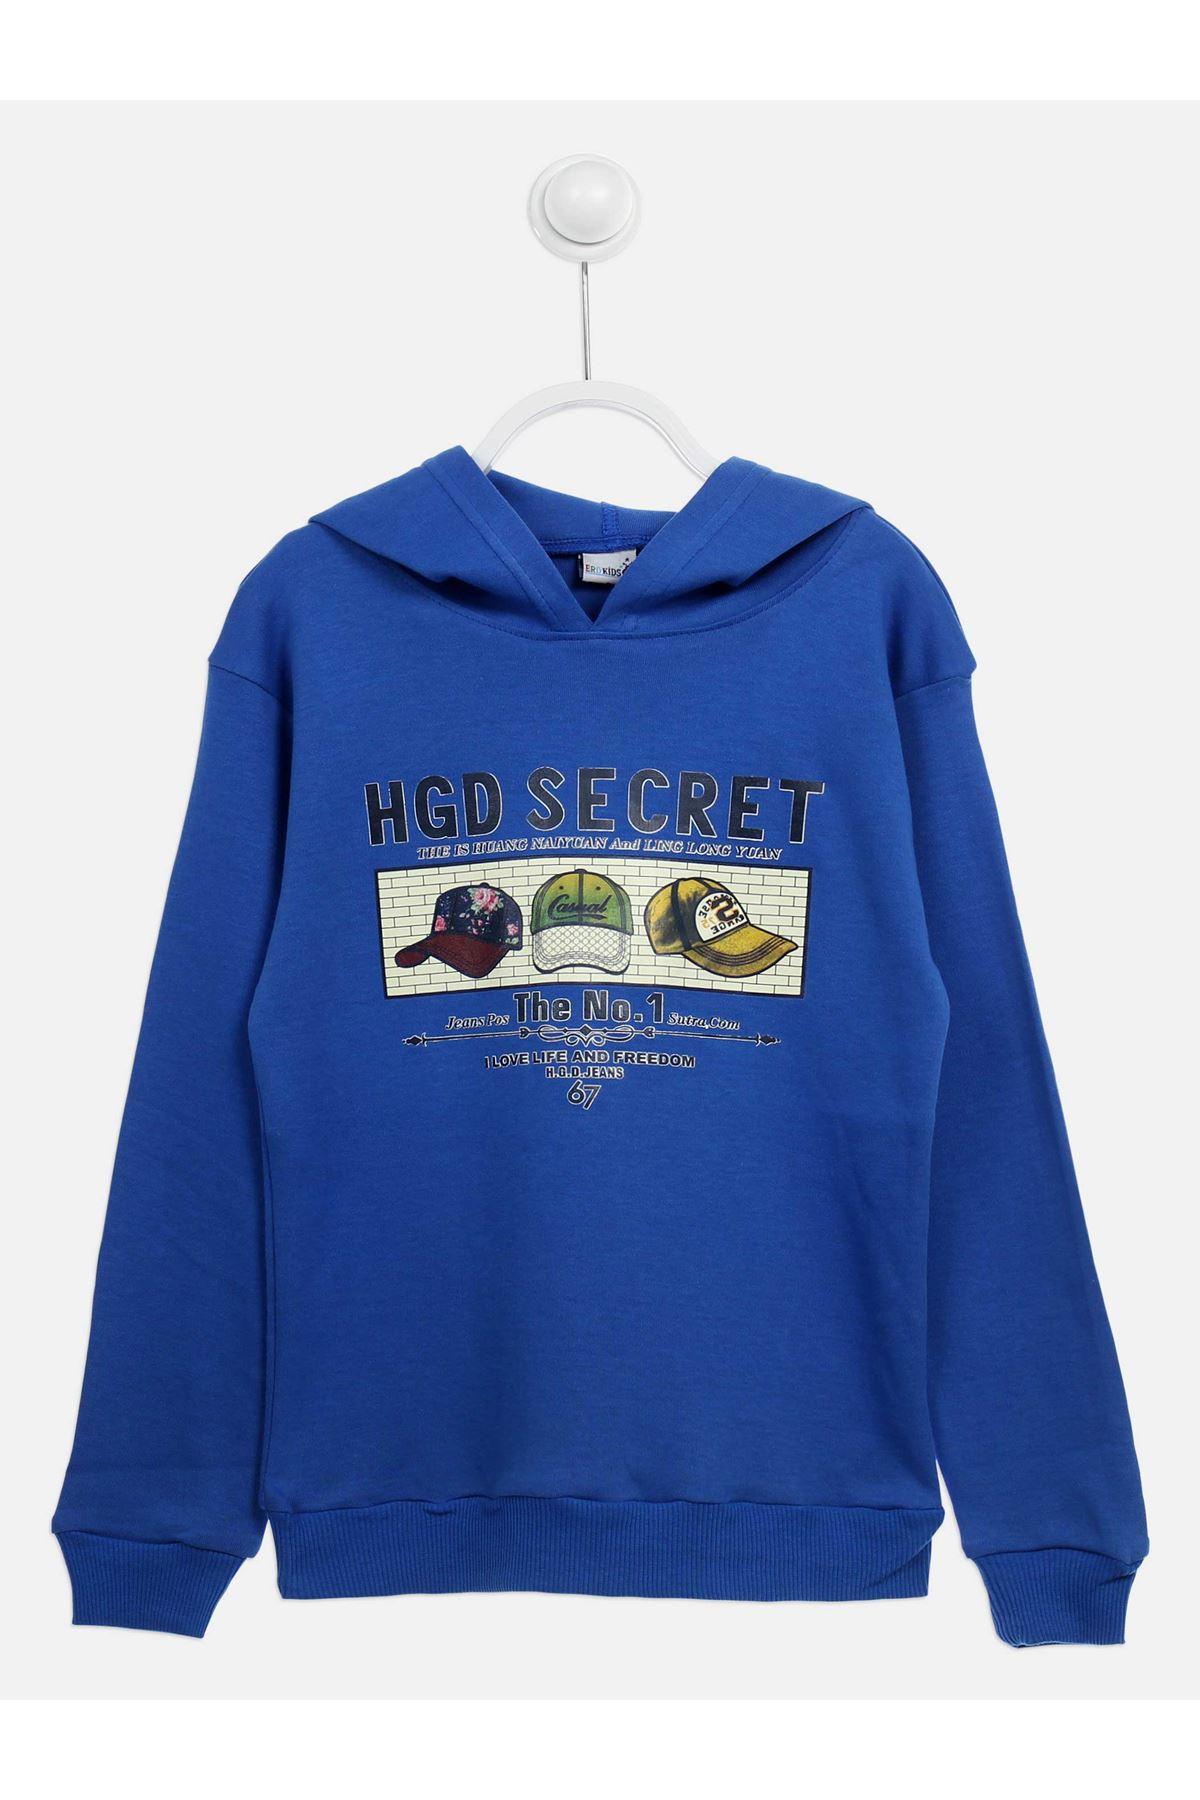 Sax Seasonal Hooded Boy's Sweatshirt